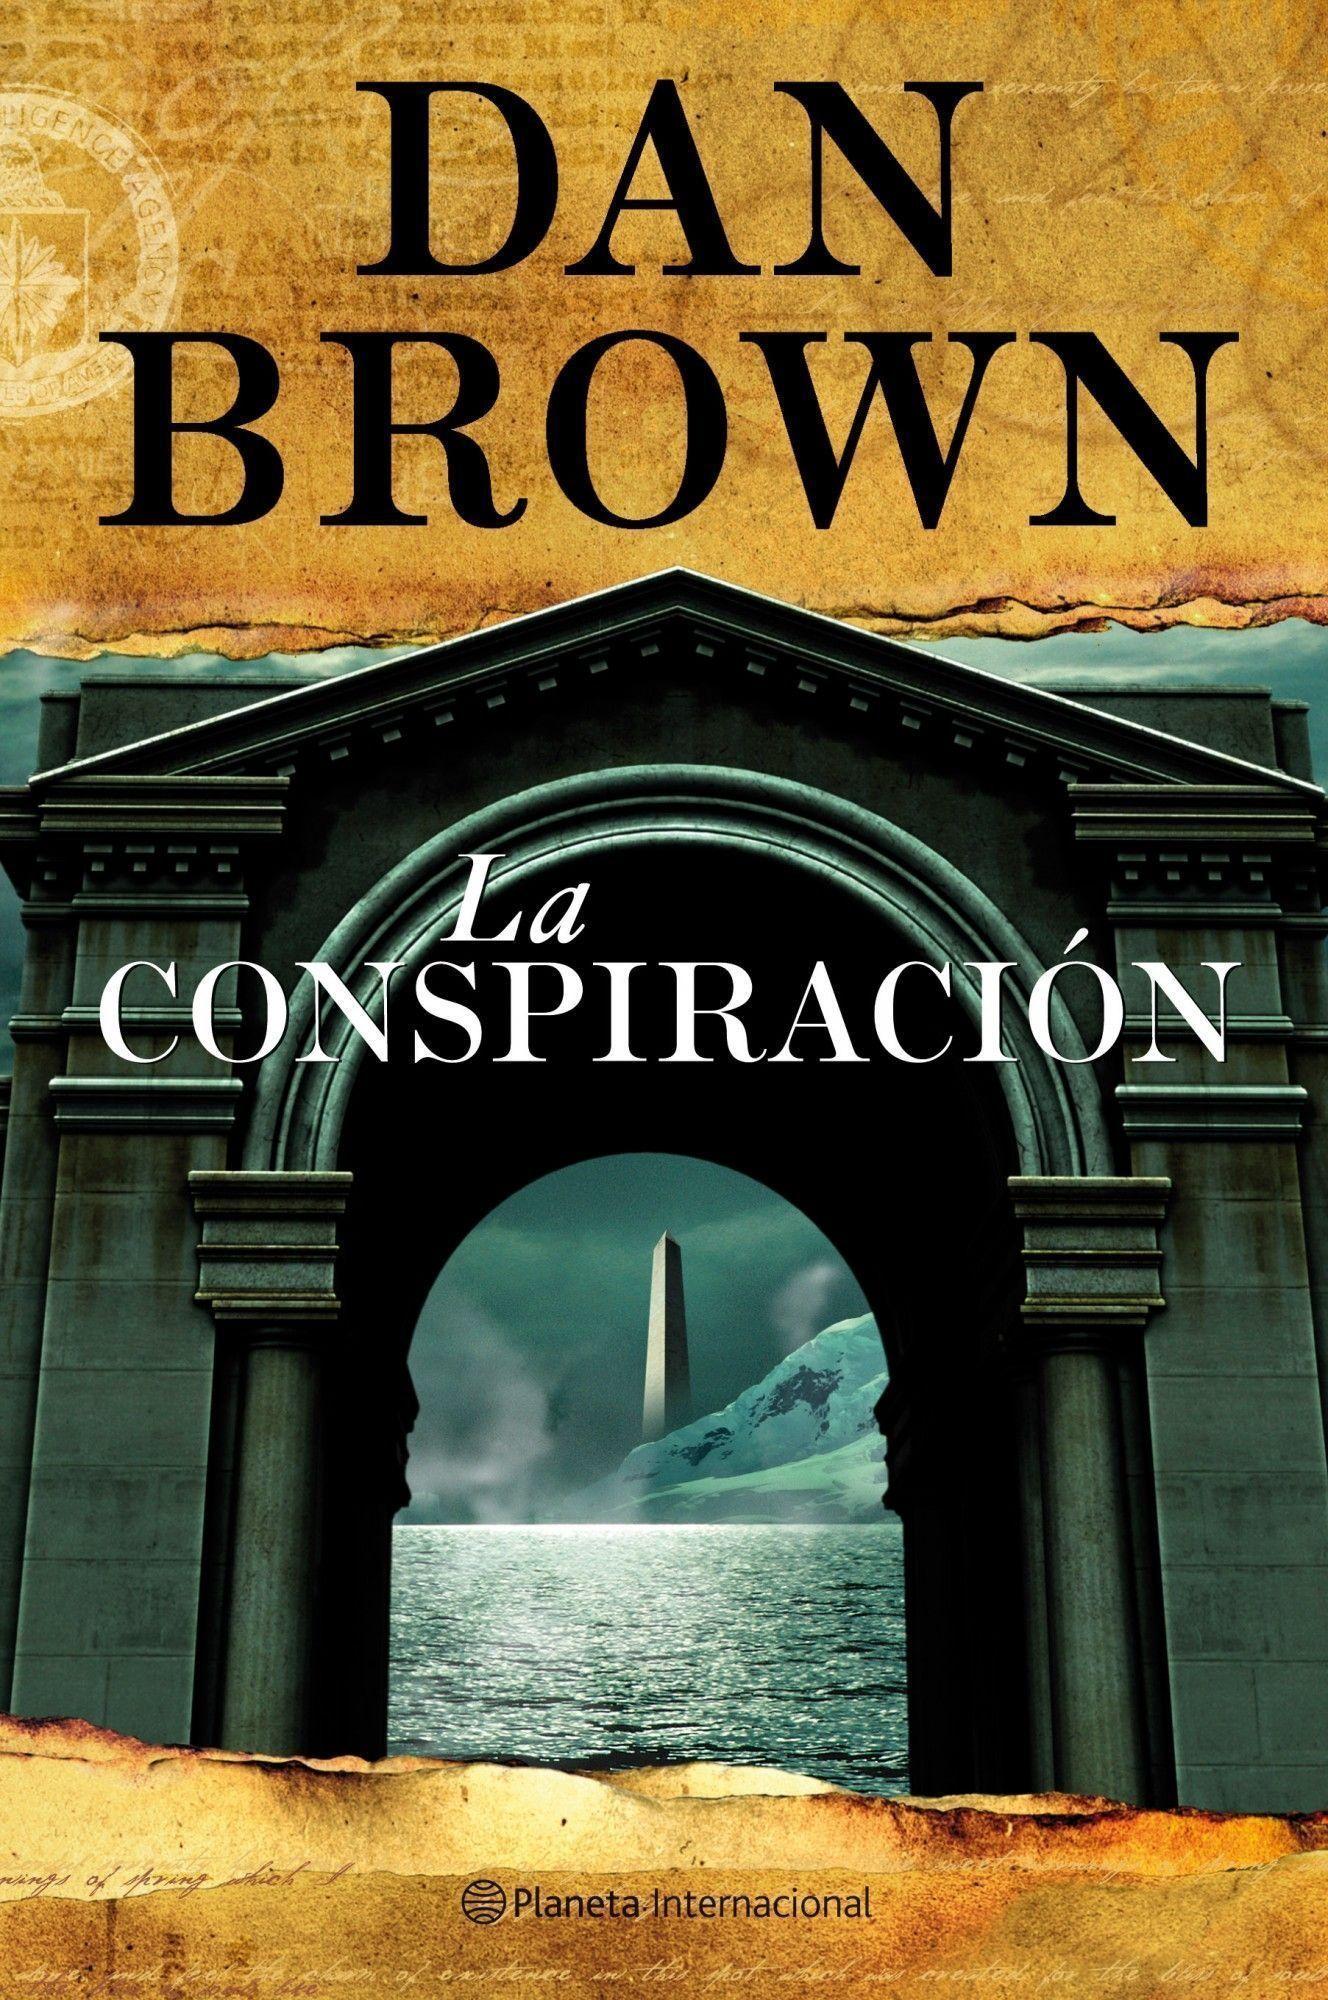 Descarga La Conspiración Dan Brown Https Ift Tt 2udjmaw Dan Brown Bajar Libros Gratis Libros